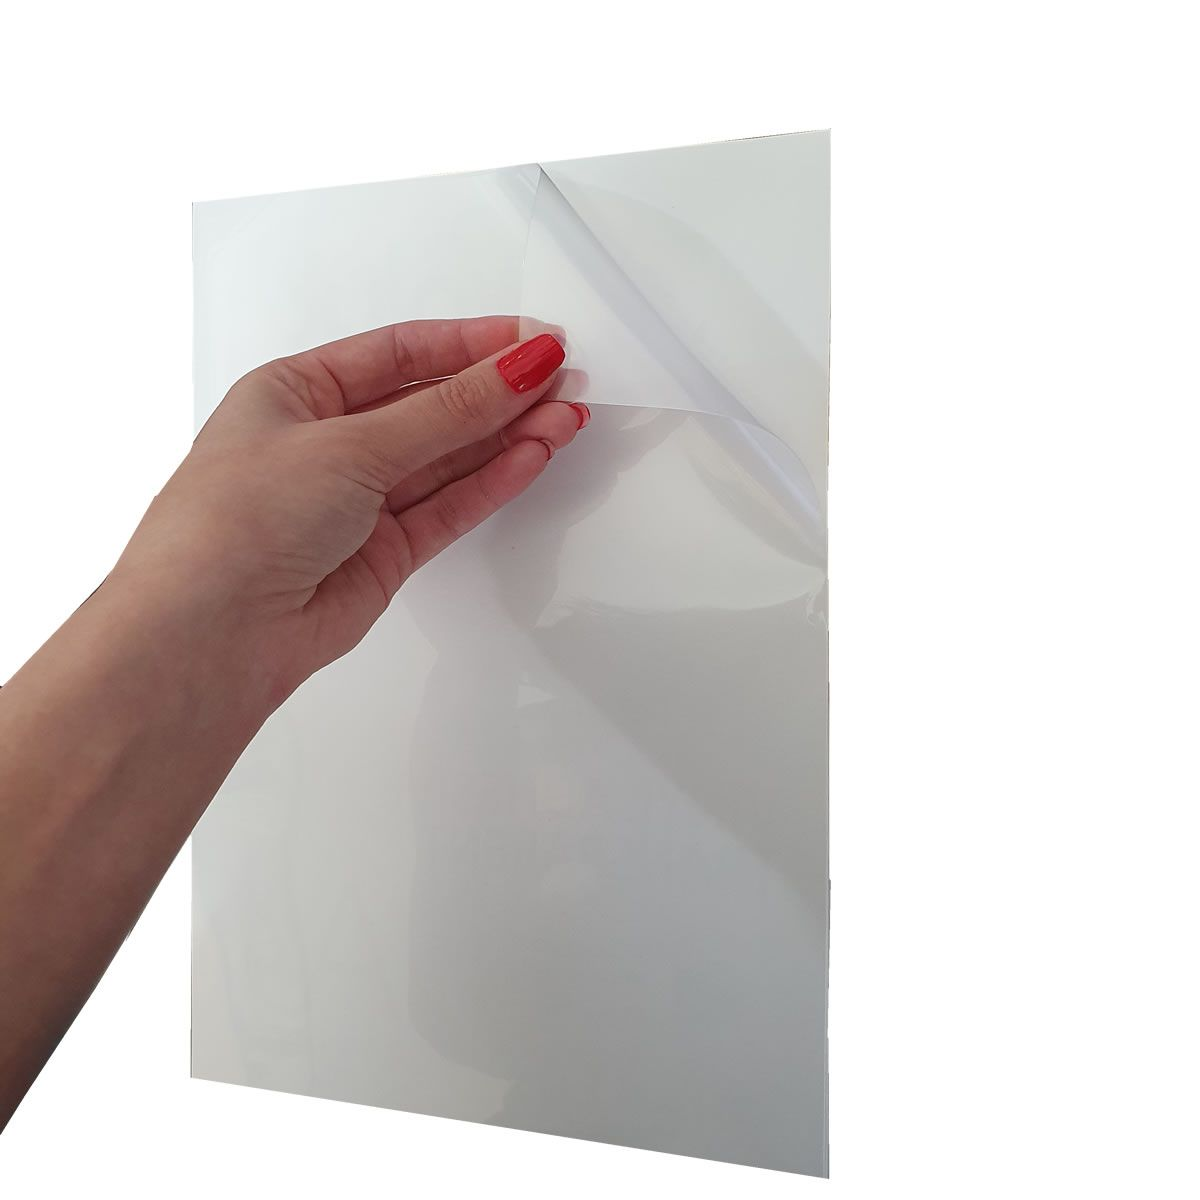 40 Adesivos Vinil Transparentes Impressoras Jato De Tinta A4